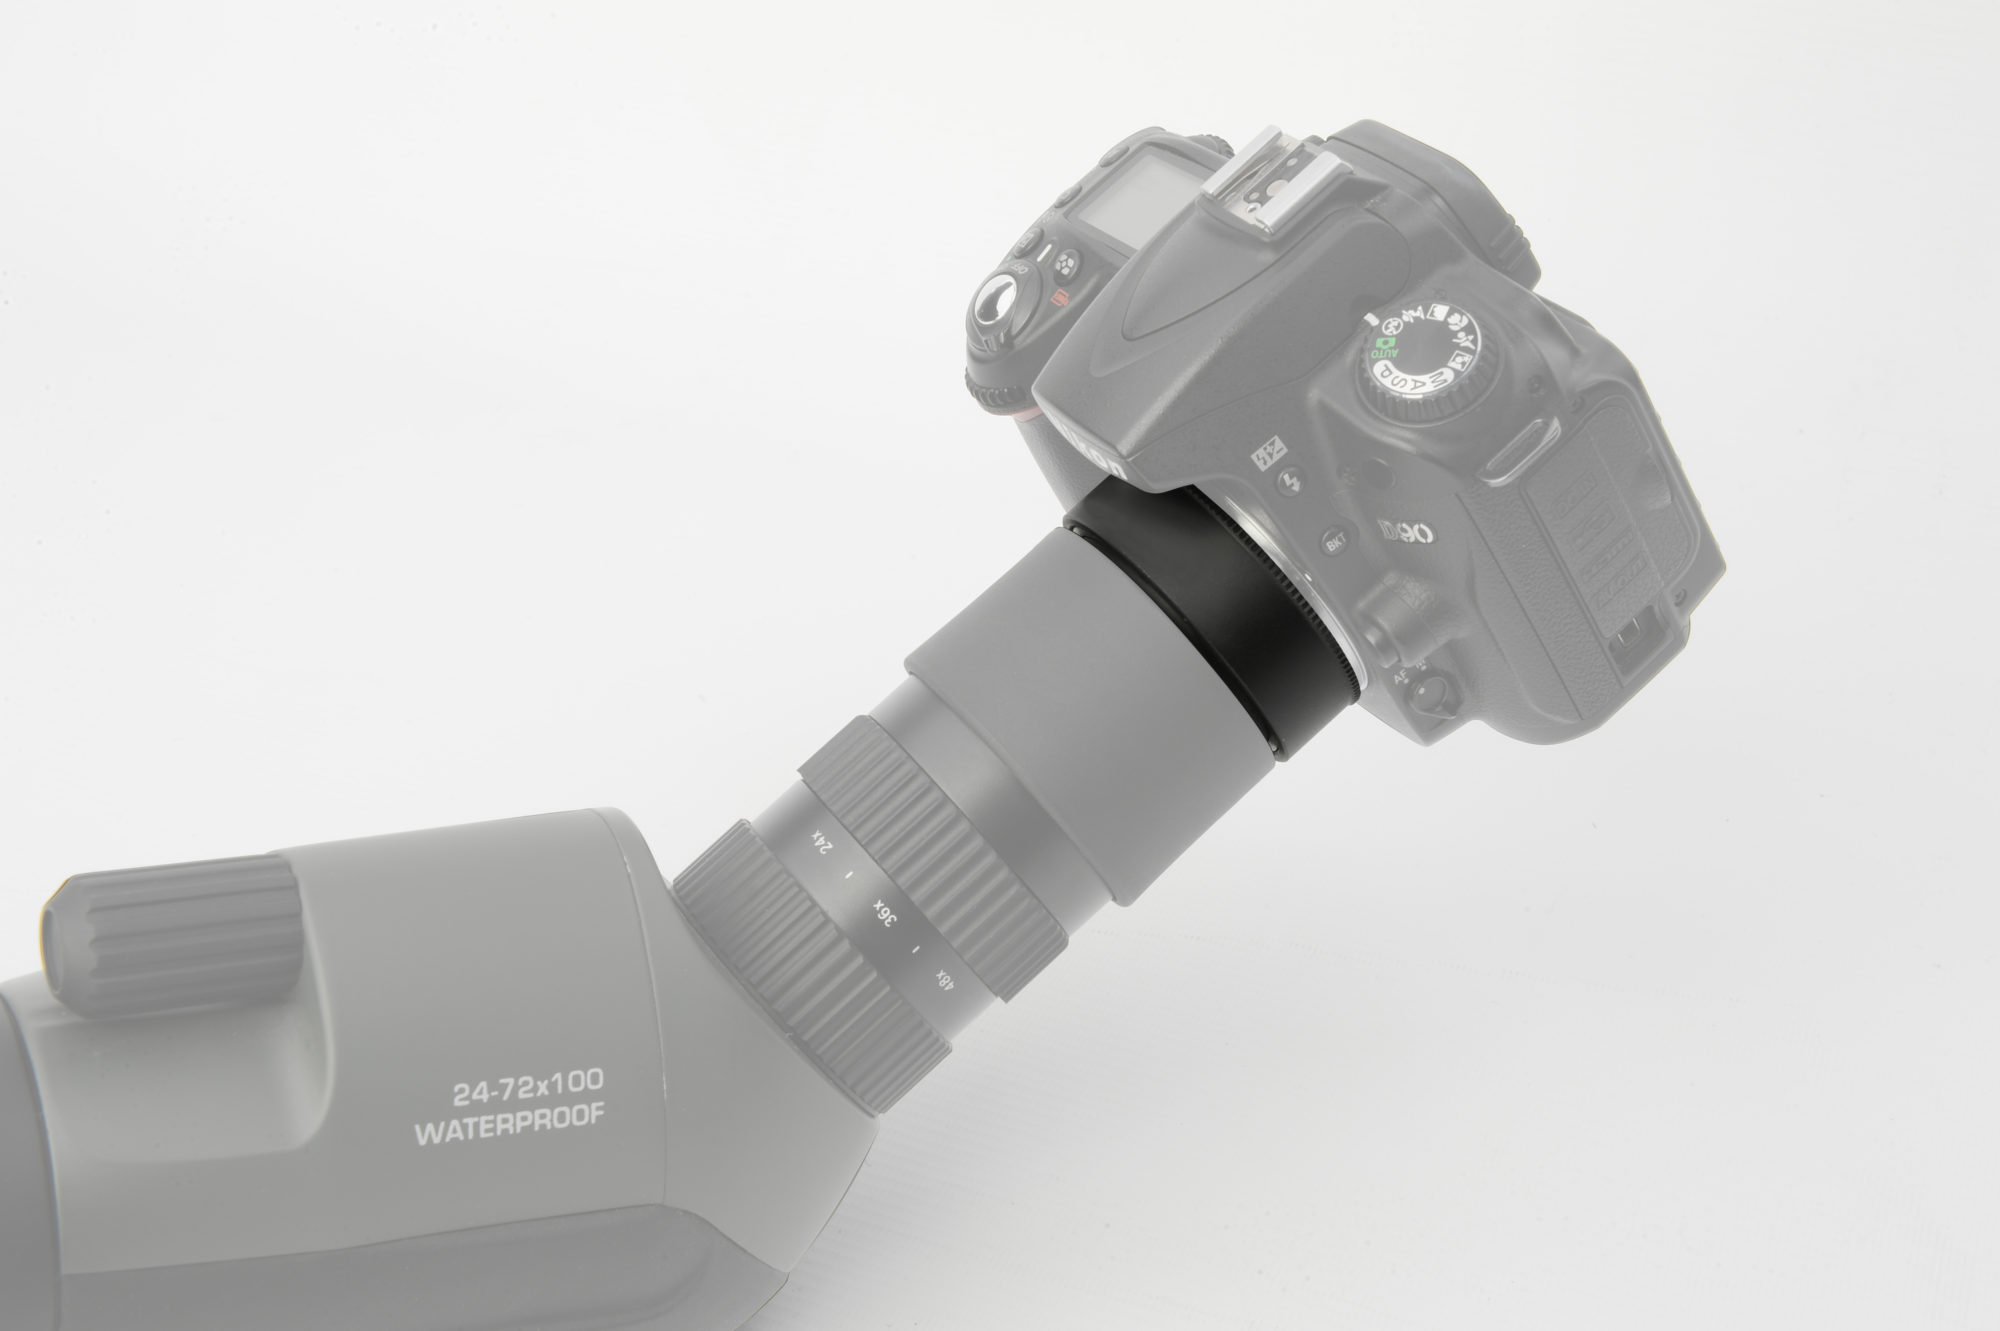 Bresser fotoadapter nikon für condor spektive telescope.house